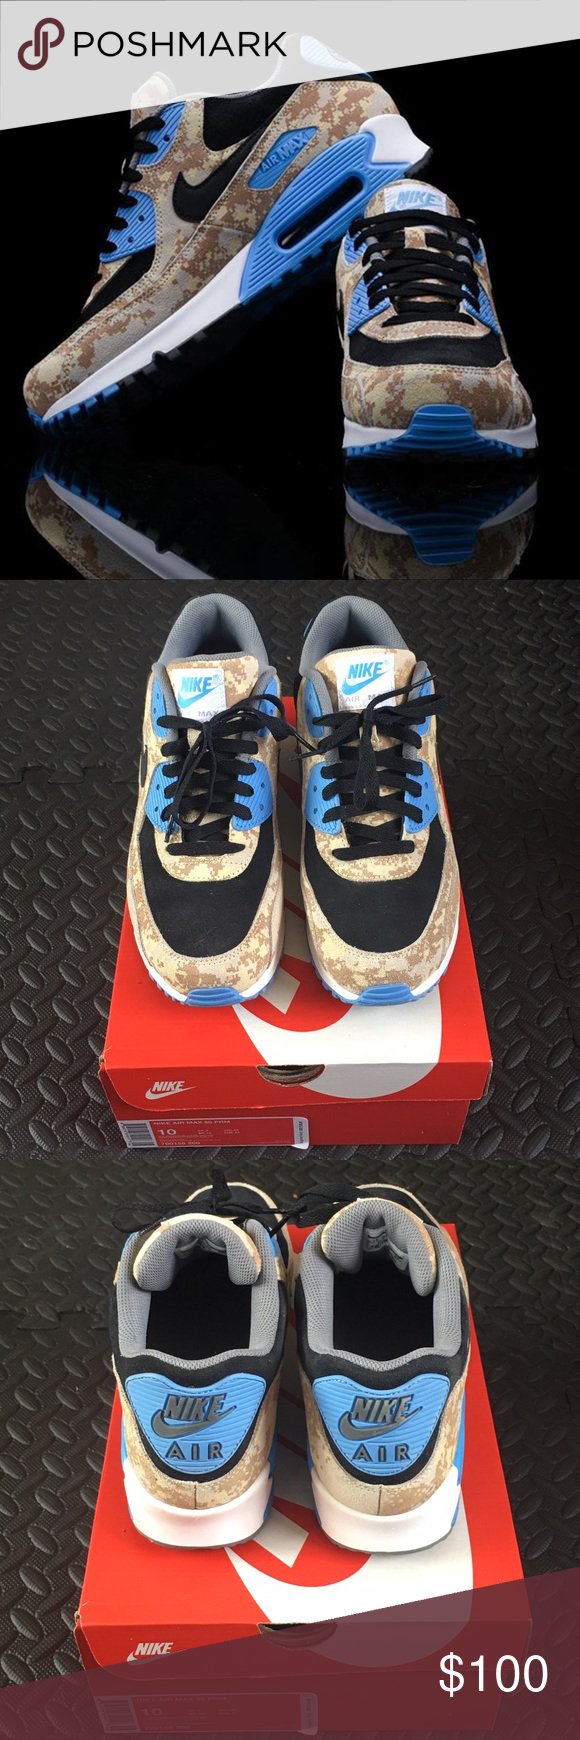 newest 470c1 a31c5 ... france nike air max 90 prm blue digi camo sneakers nike air max 90 prm  810dc